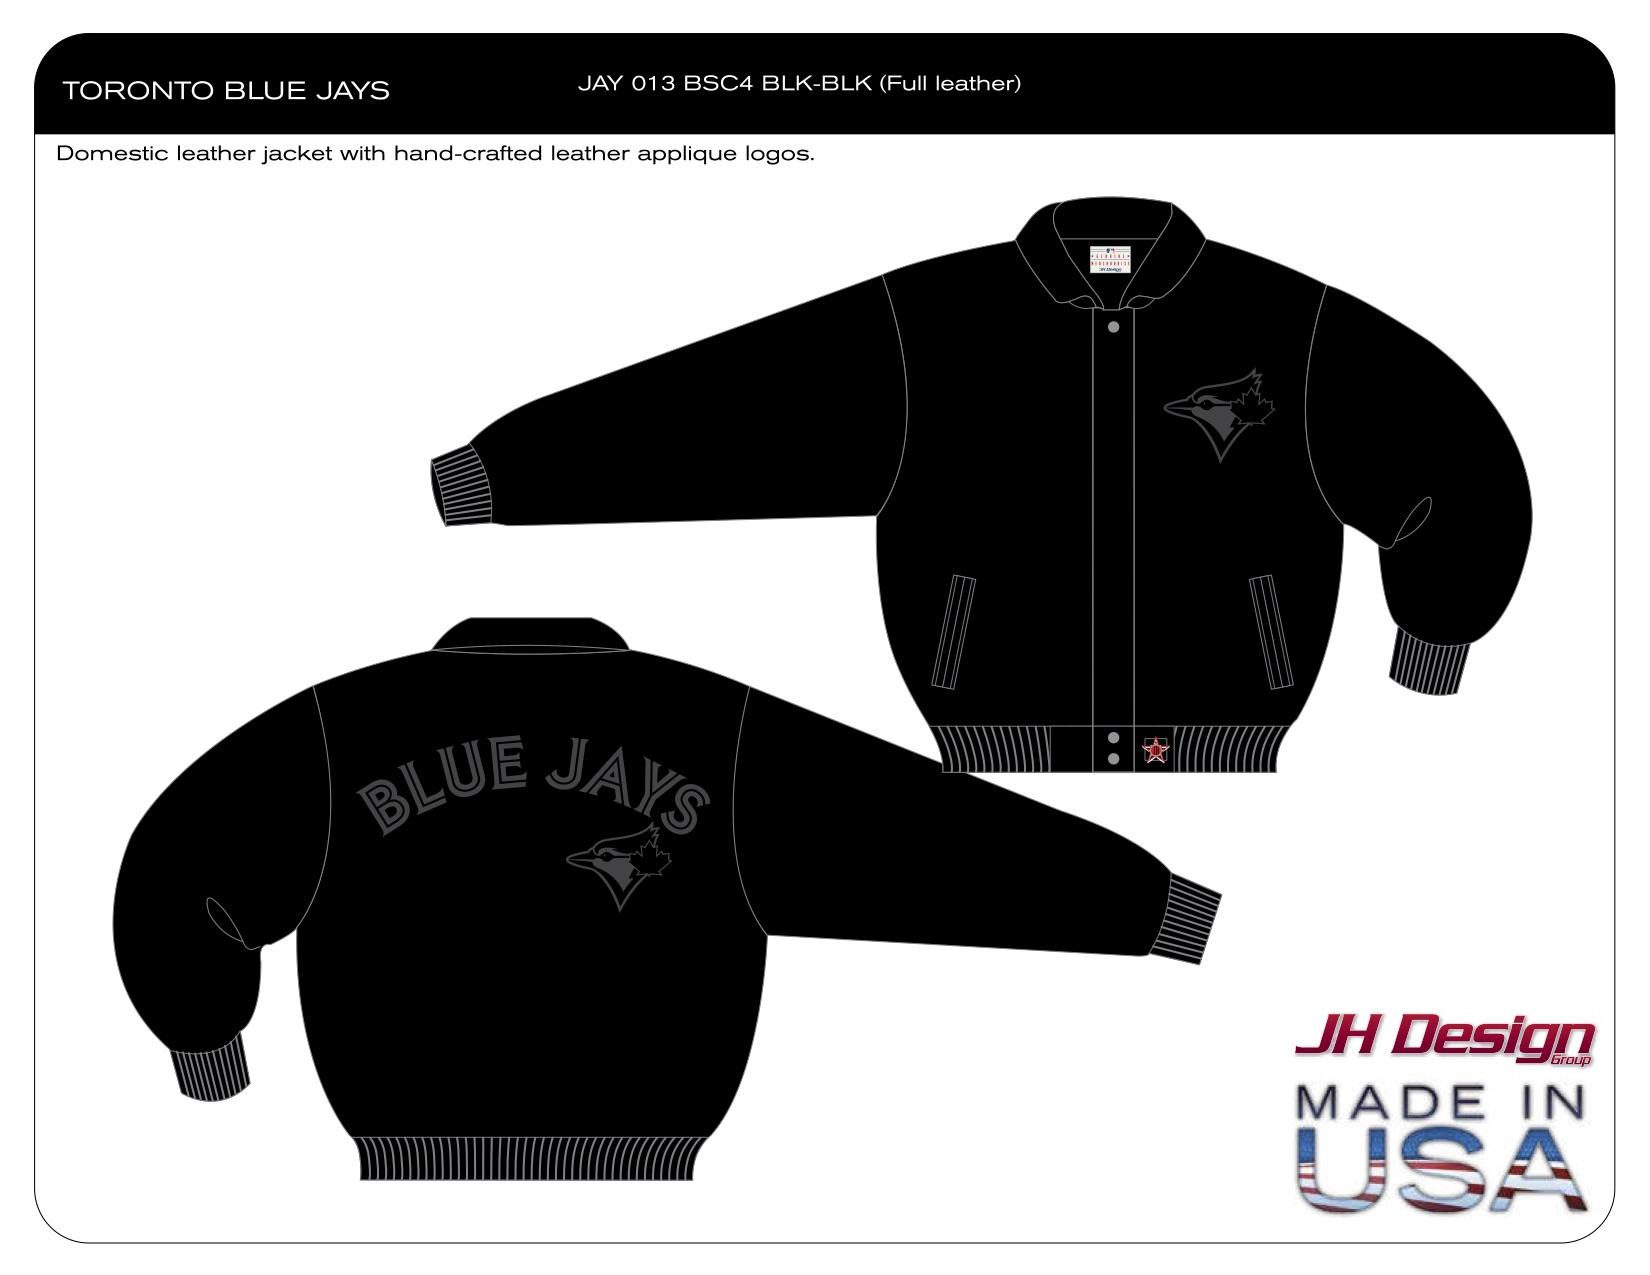 JAY 013 BSC4 BLK-BLK